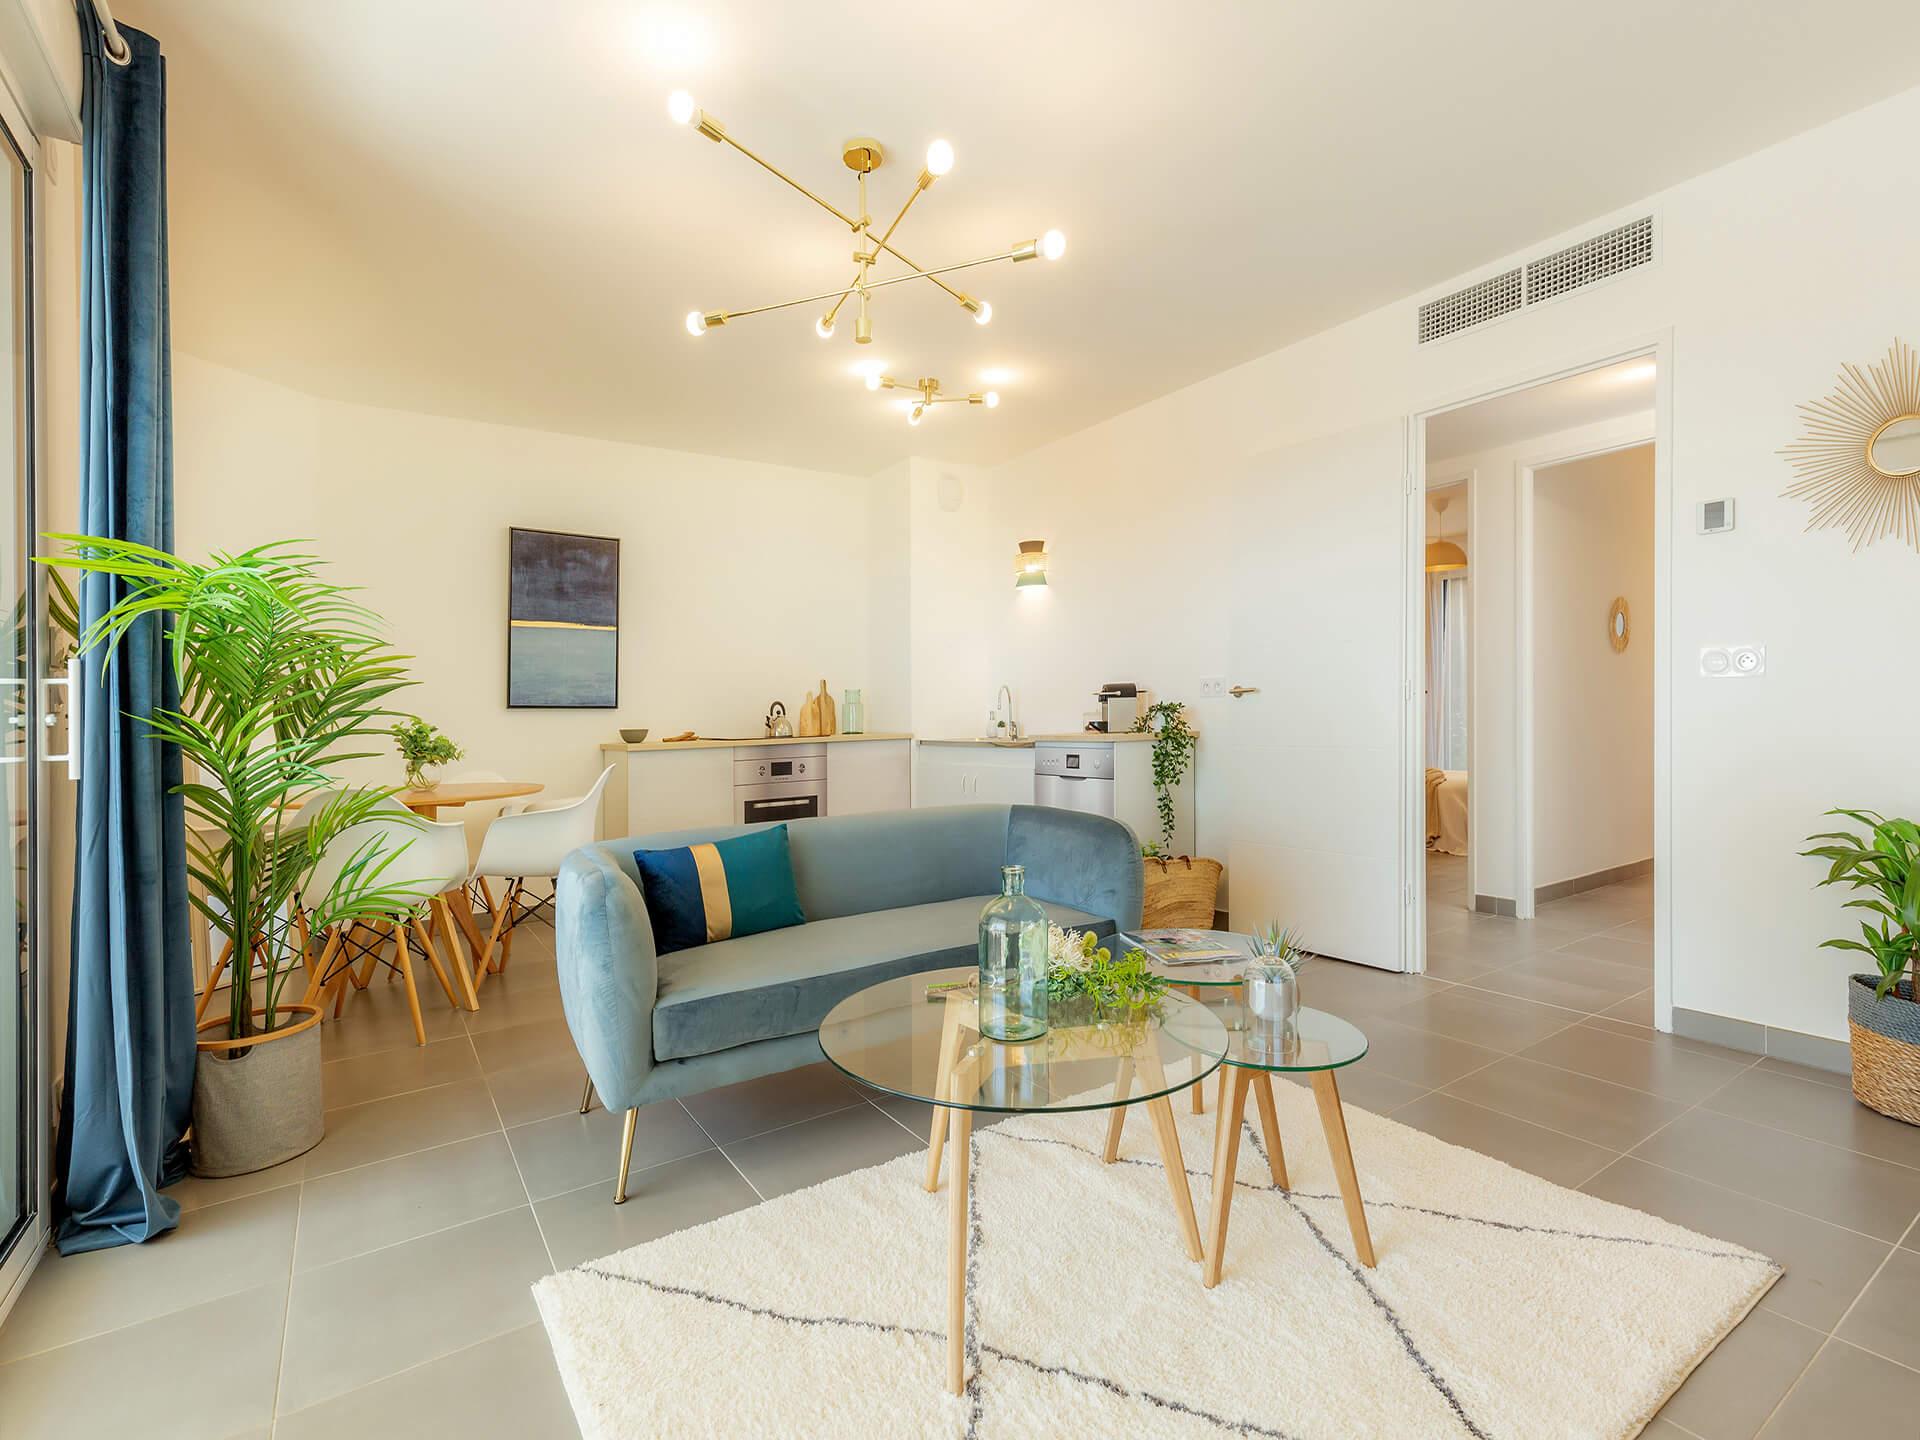 Programme immobilier neuf Le Domaine d'Acanthe